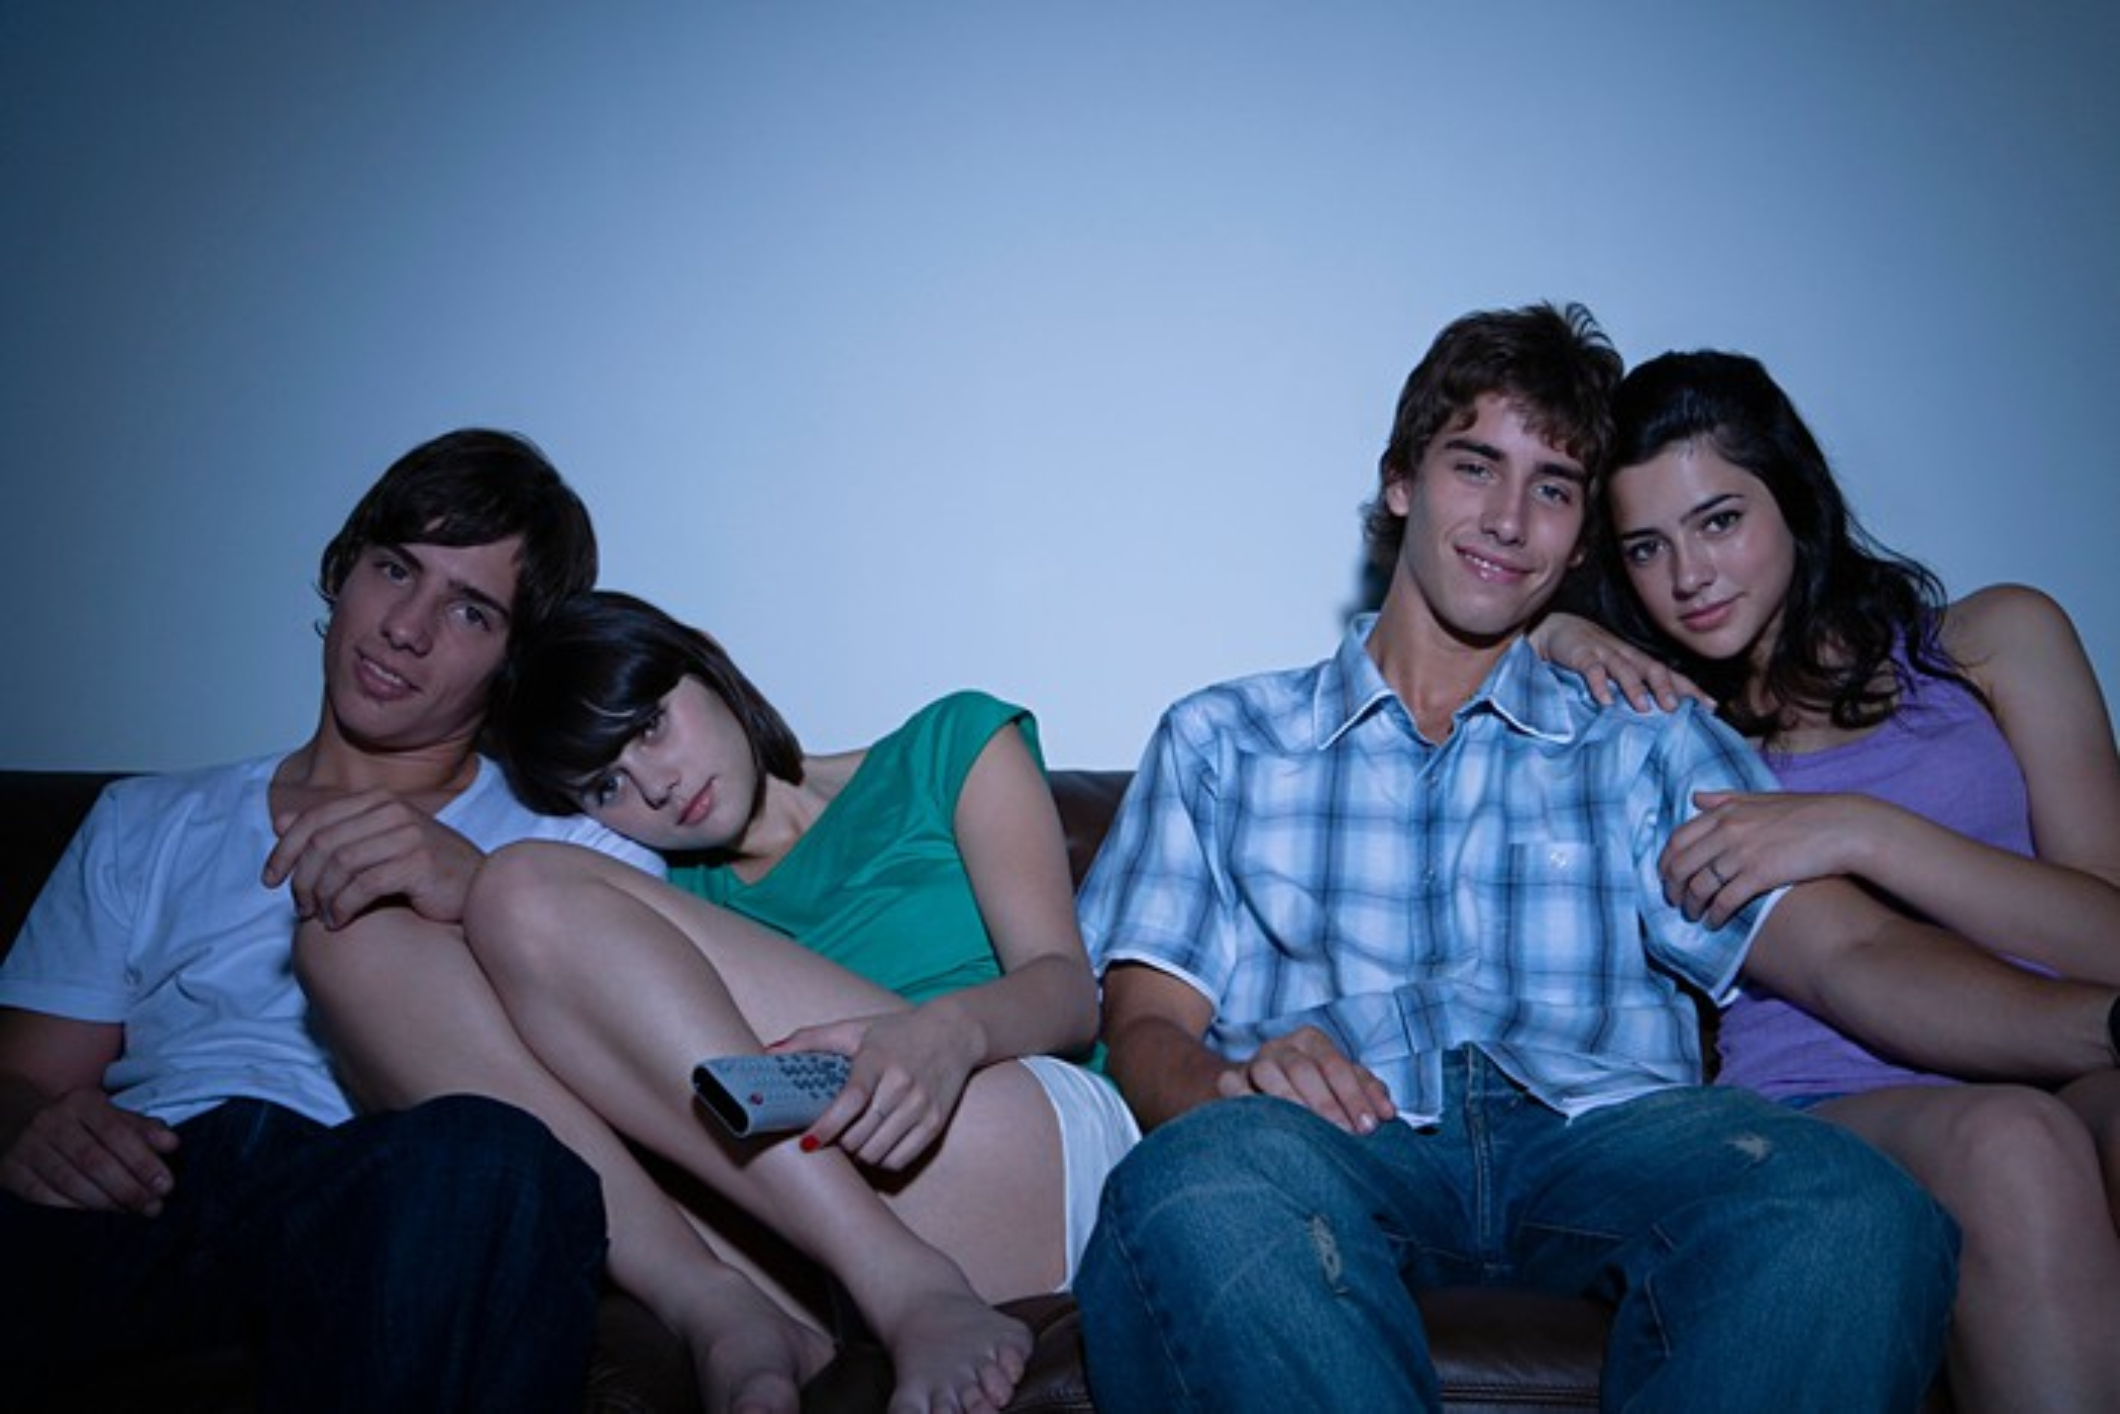 Friends watching TV in a darkened room.